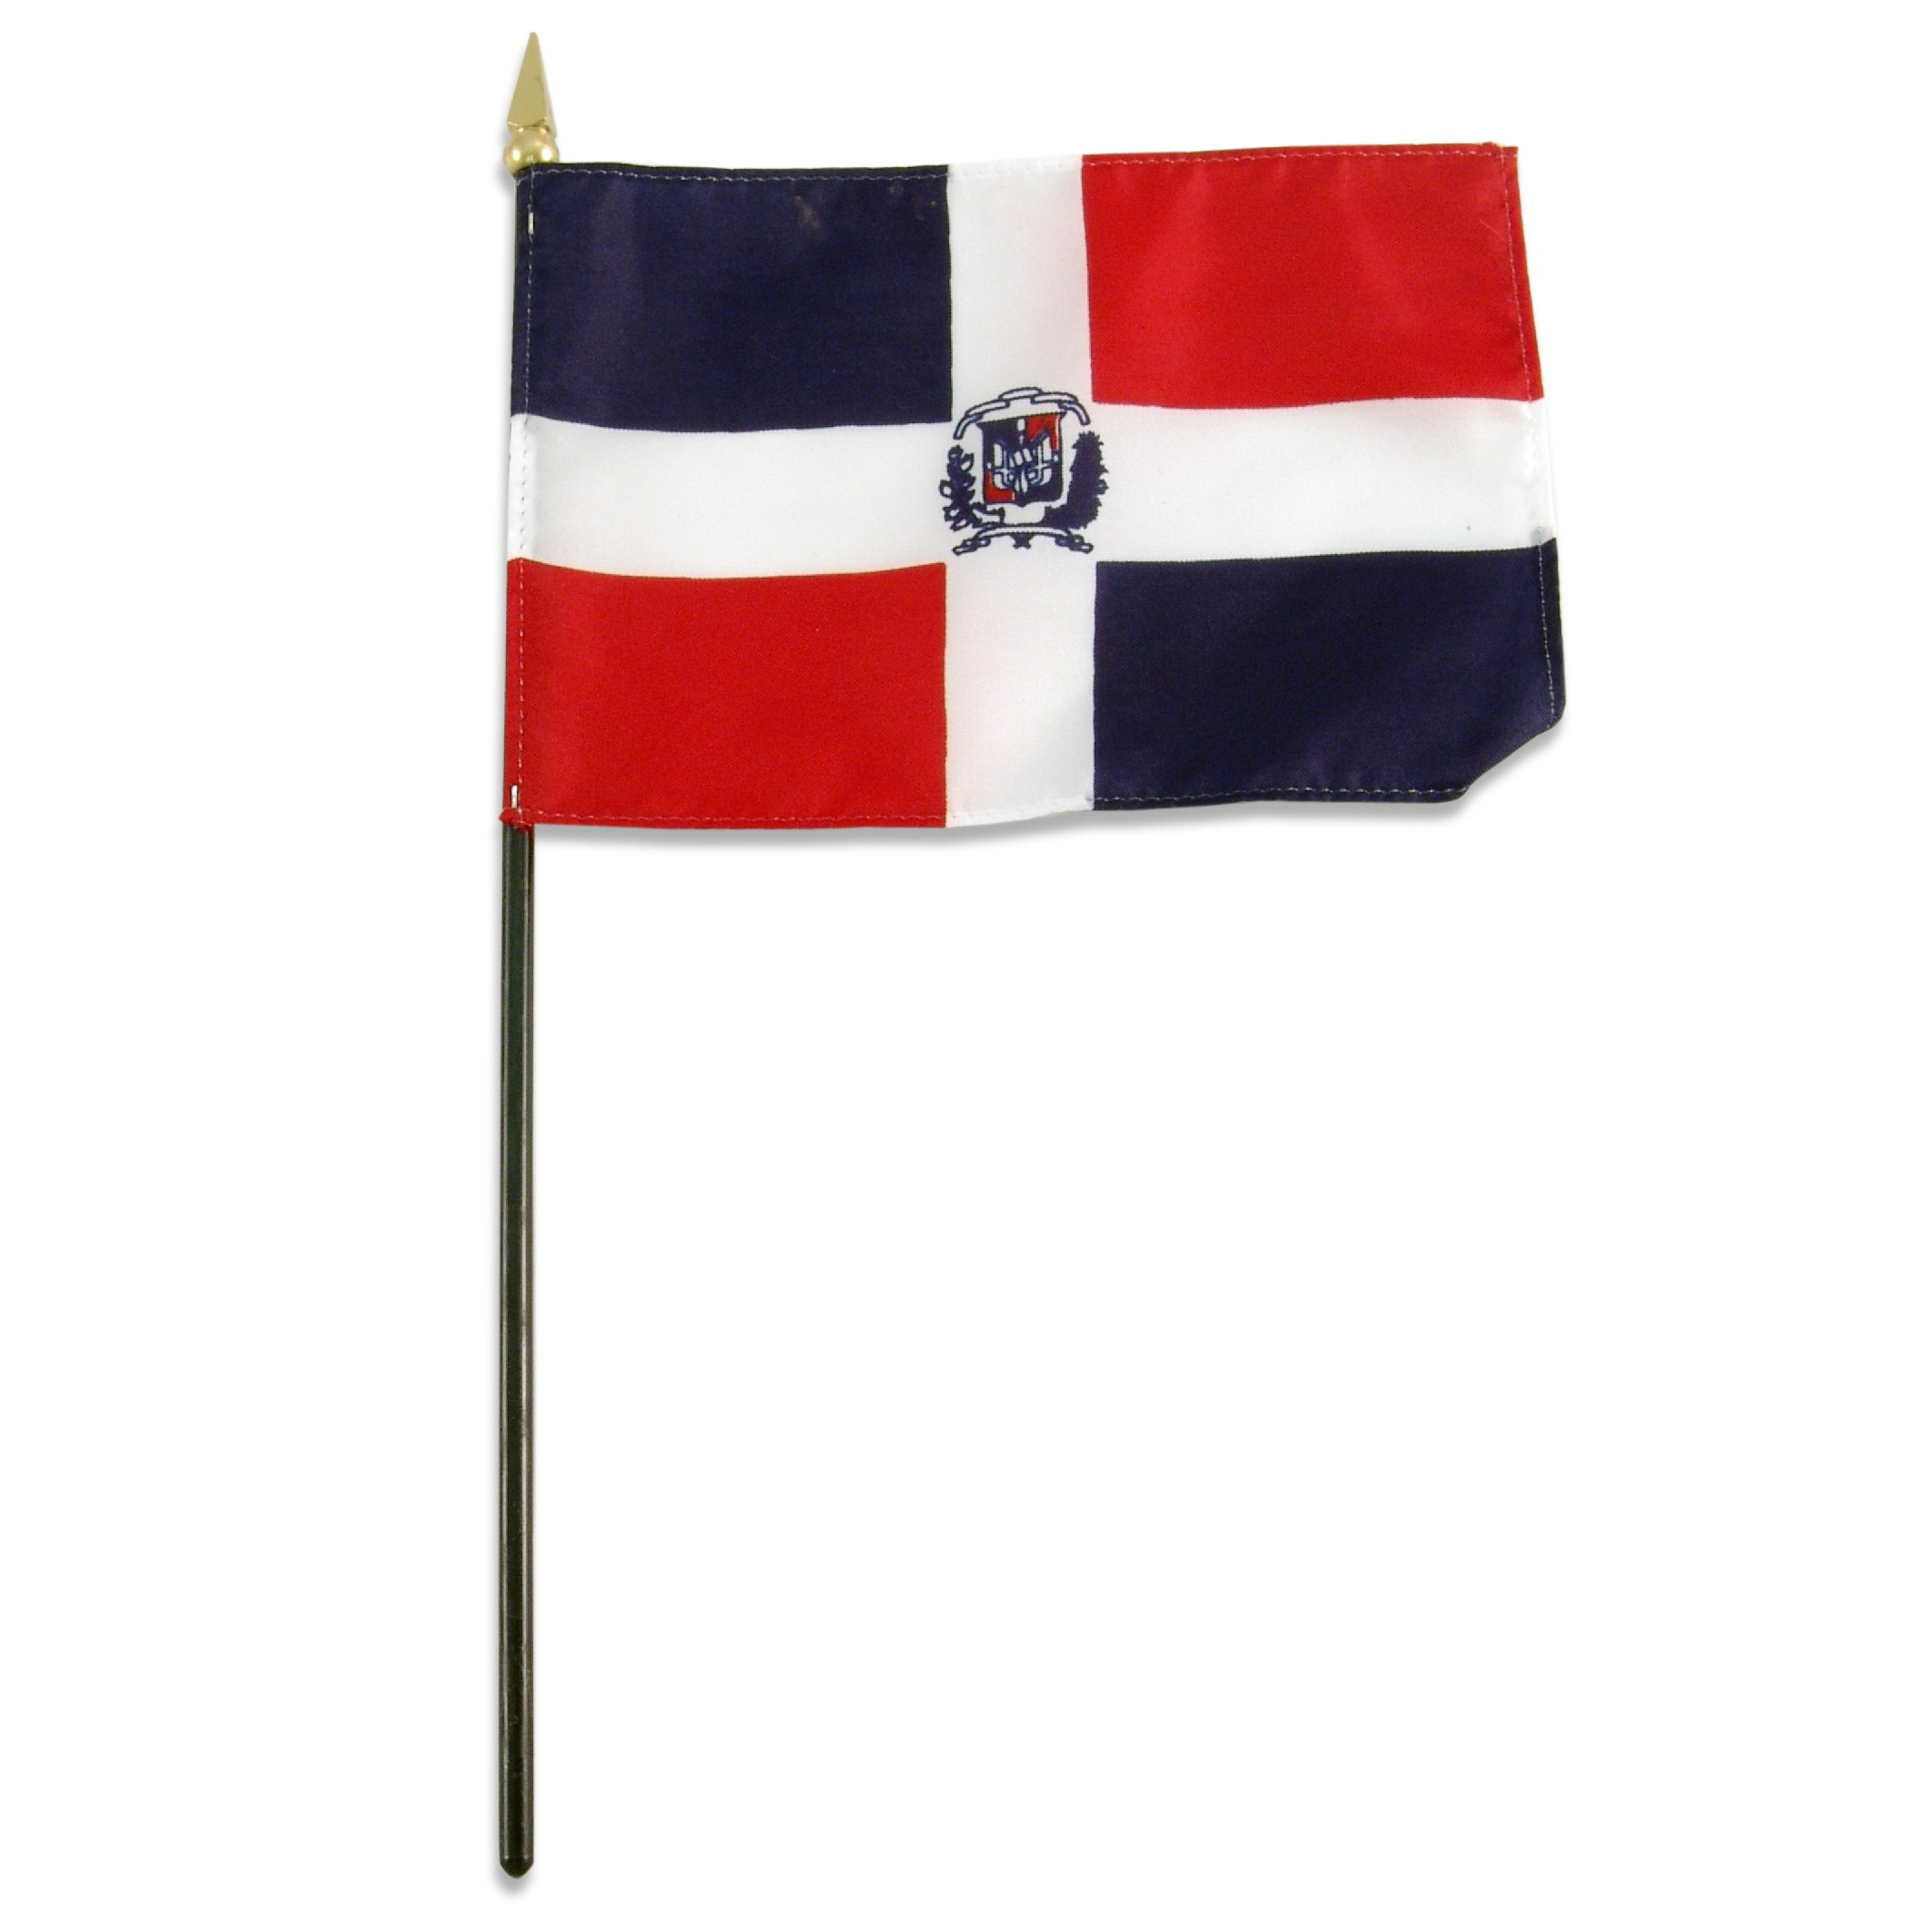 Dominica flag clipart.